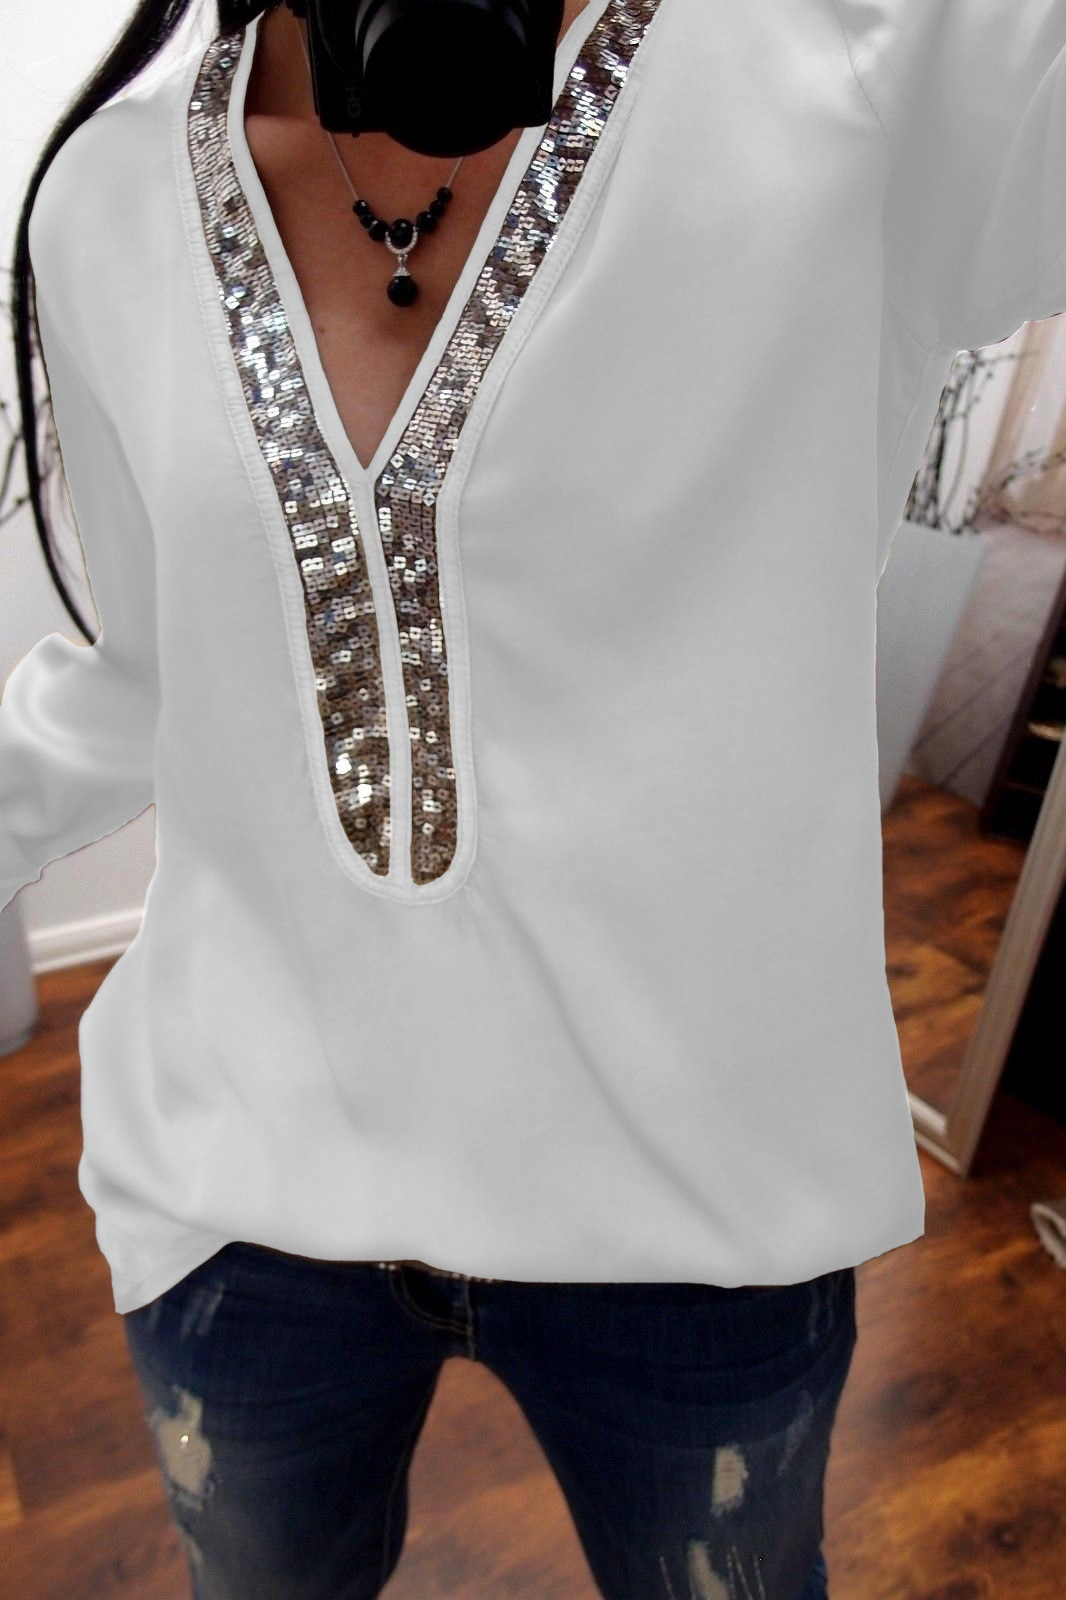 Sequins Shirt Women 2018 Autumn Long Sleeve V-neck Plus Size Casual Blouse Women Shirts Tops Patchwork Streetwear S-5XL WS9722M 2